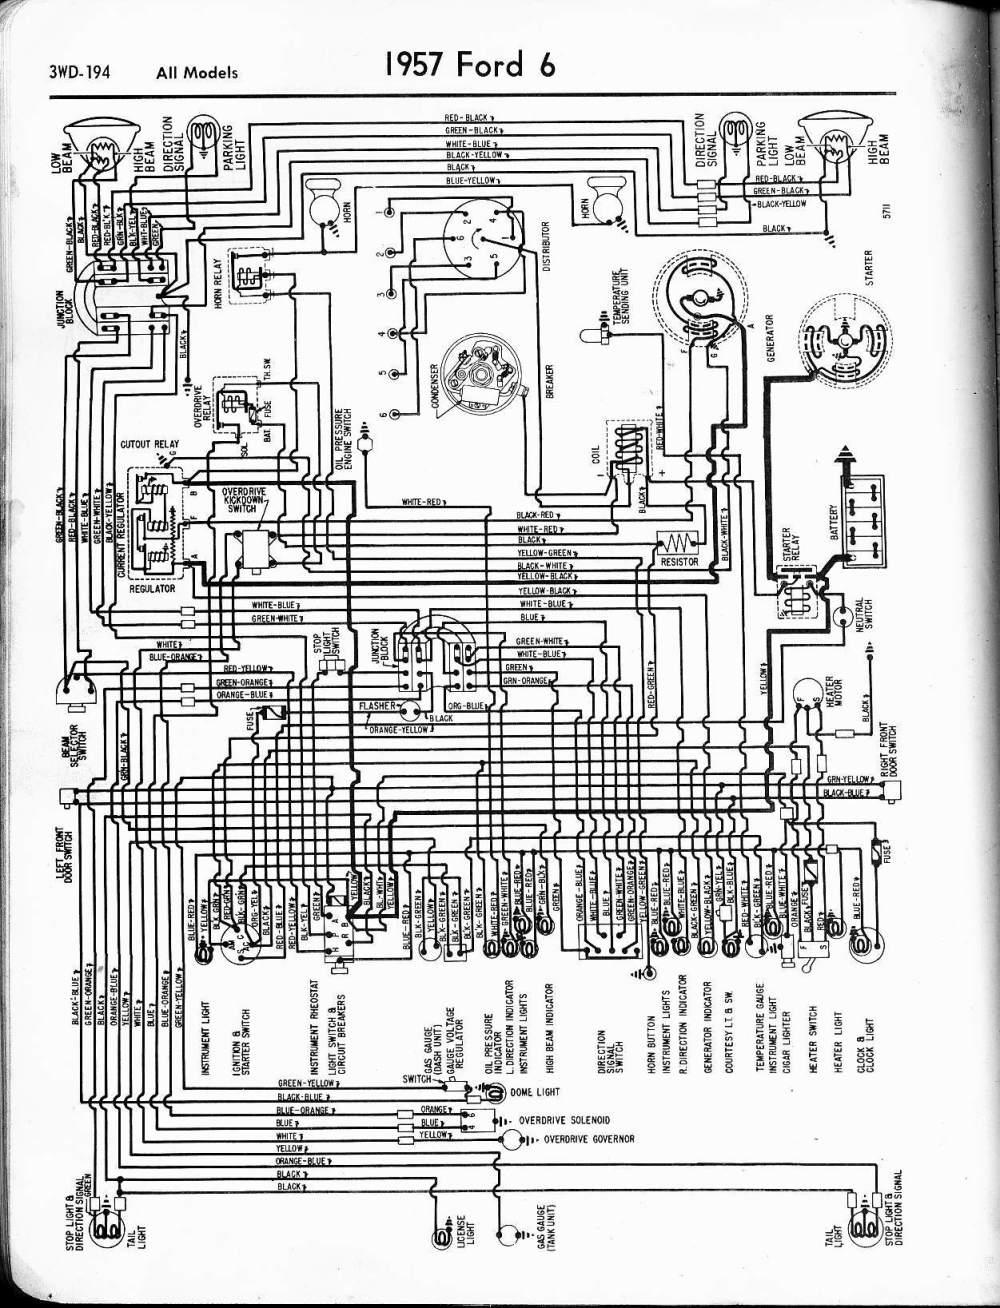 medium resolution of 1977 ford 351m f150 wiring diagram wiring library 1977 ford 351m f150 wiring diagram